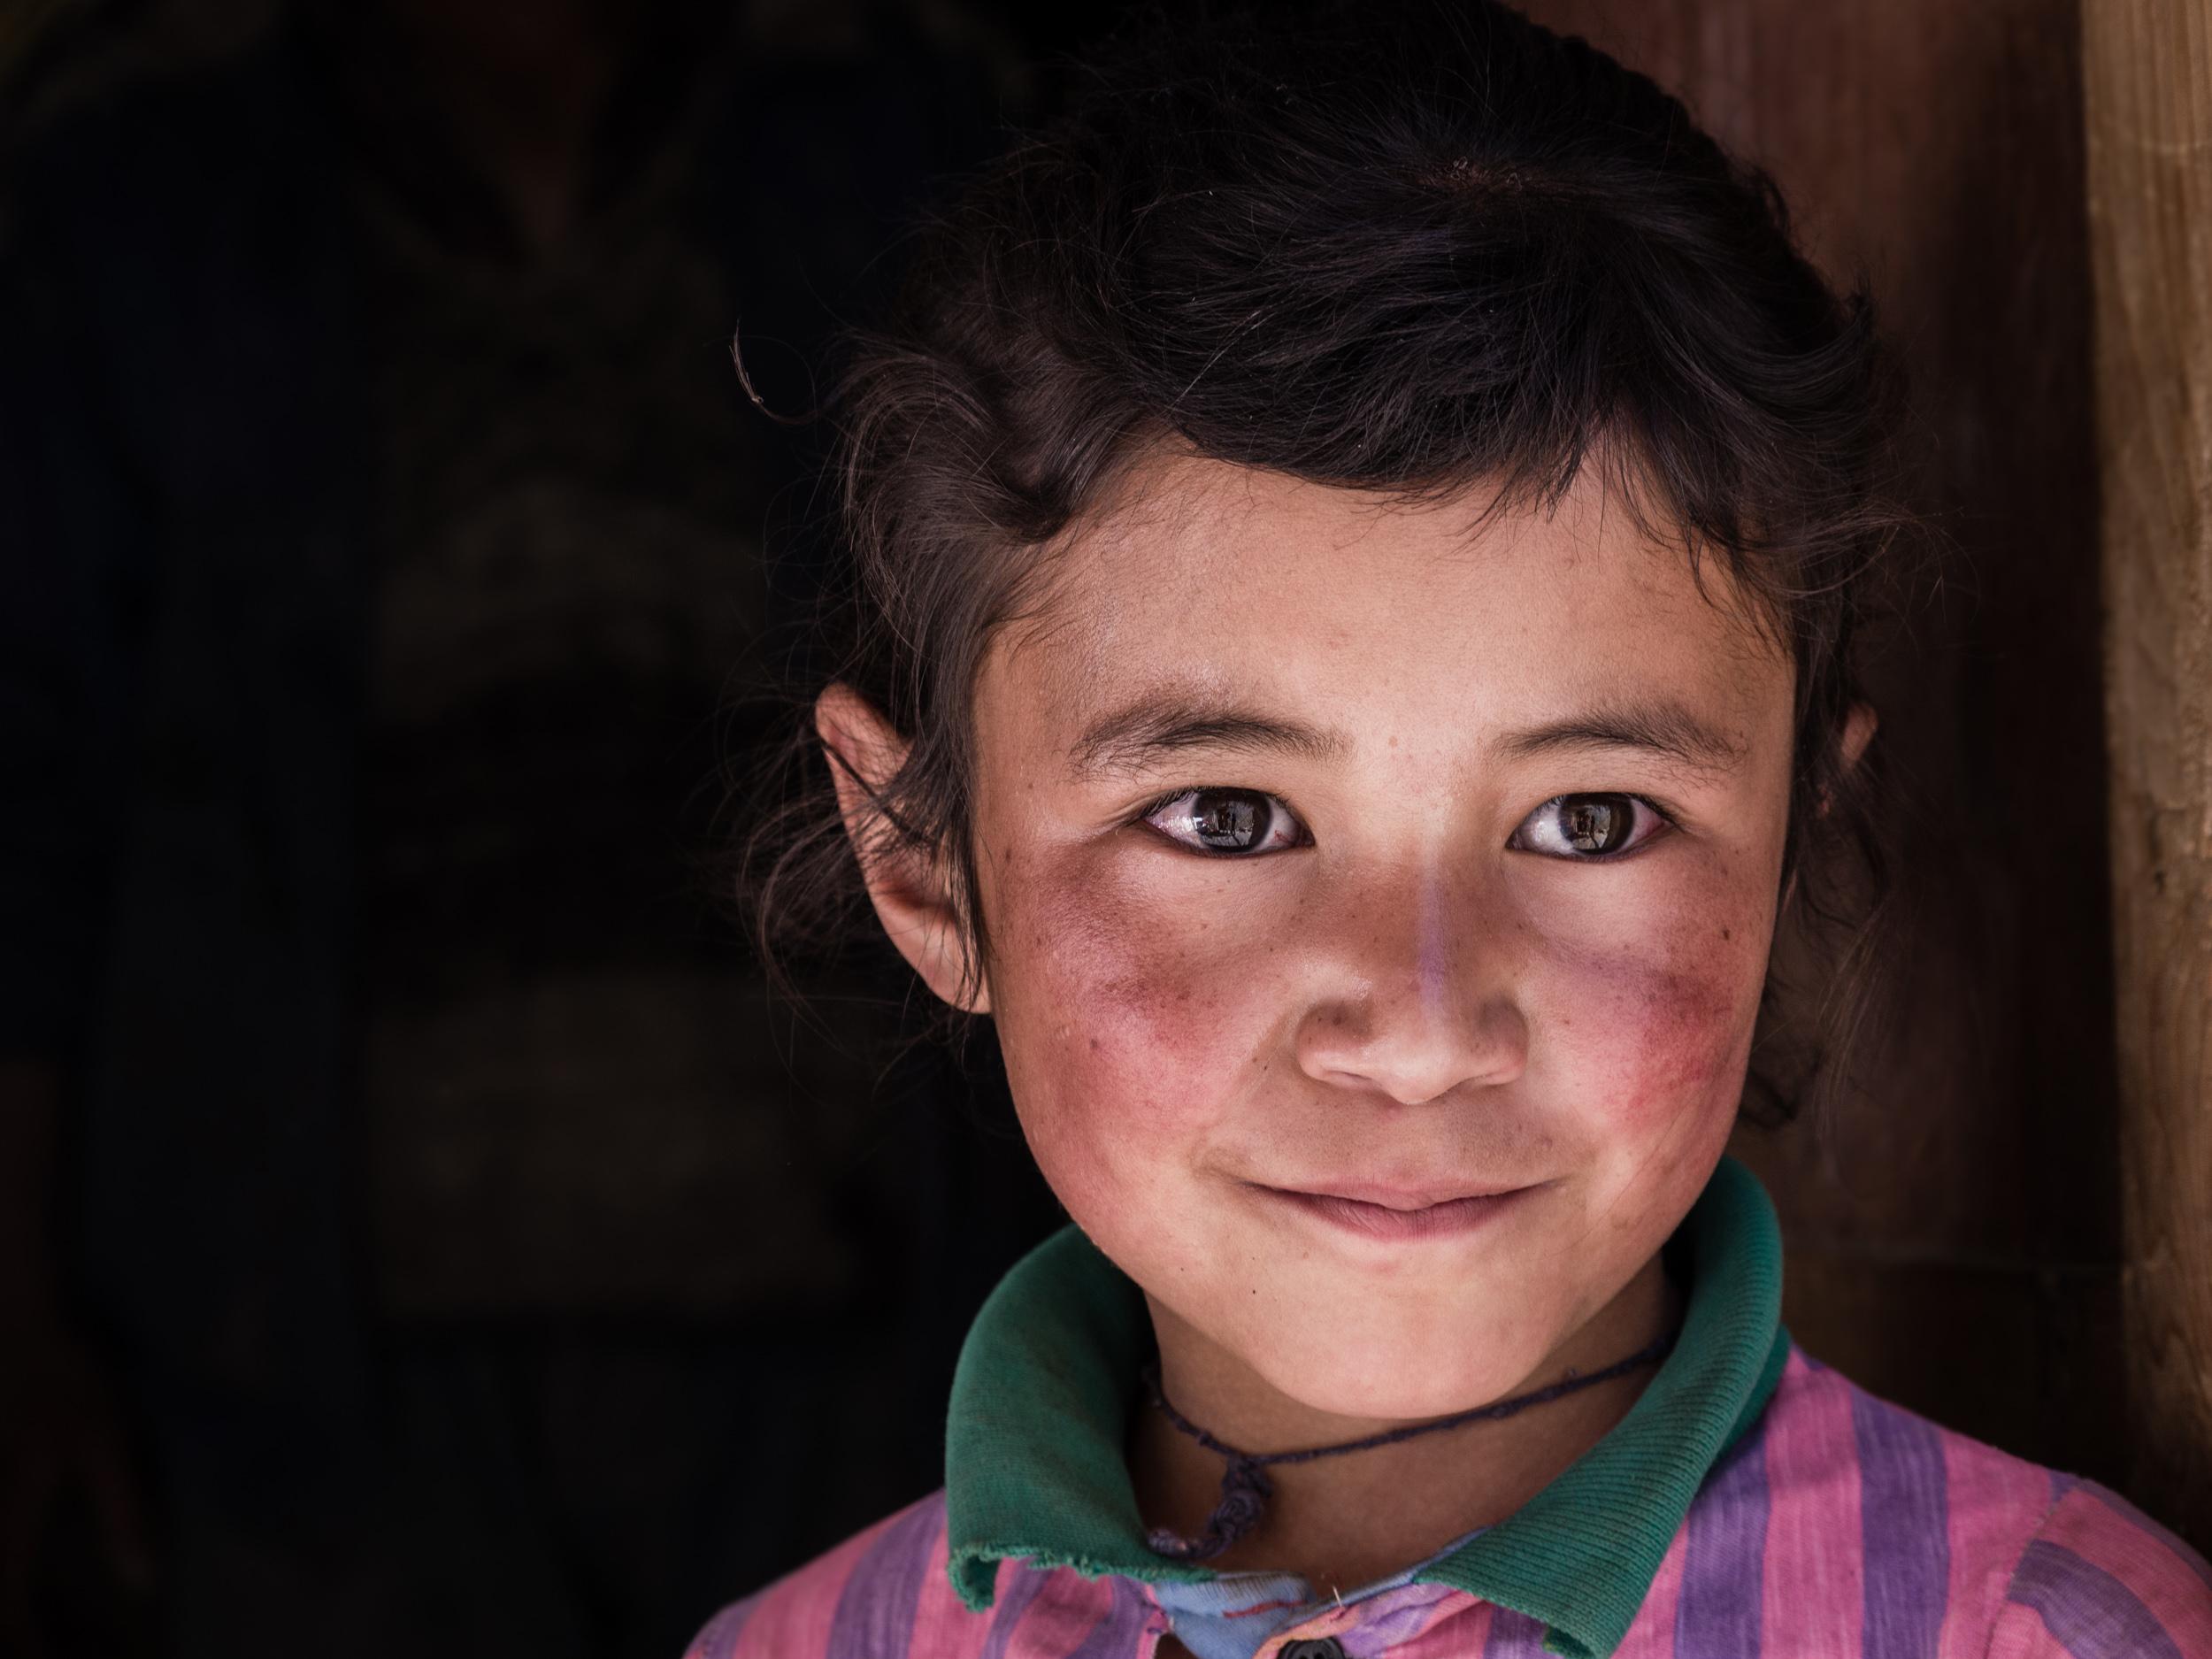 _8 Young girl markha valley India .jpg